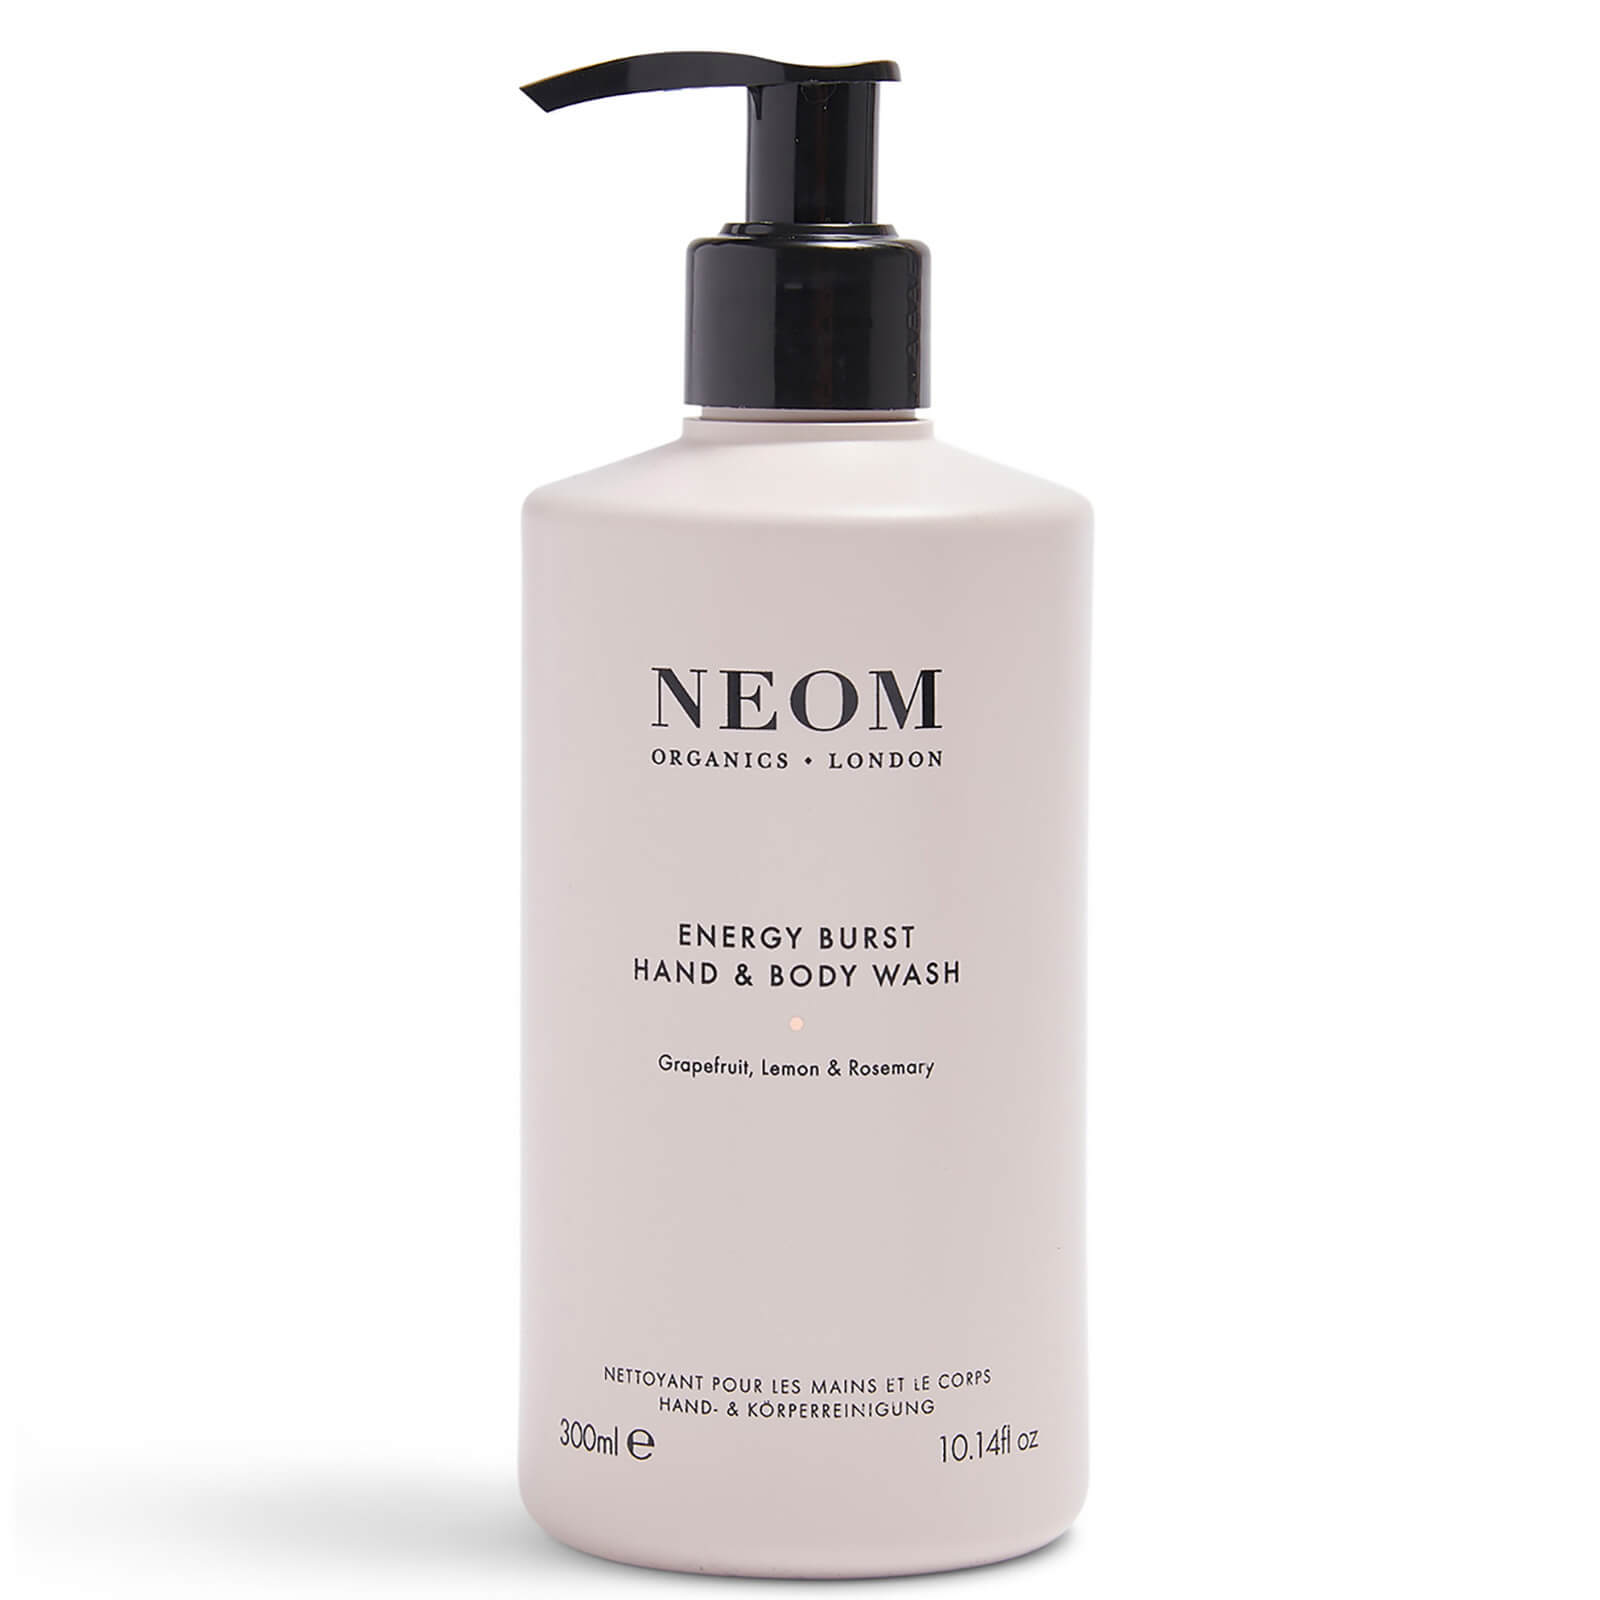 Купить NEOM Energy Burst Hand & Body Wash 300ml